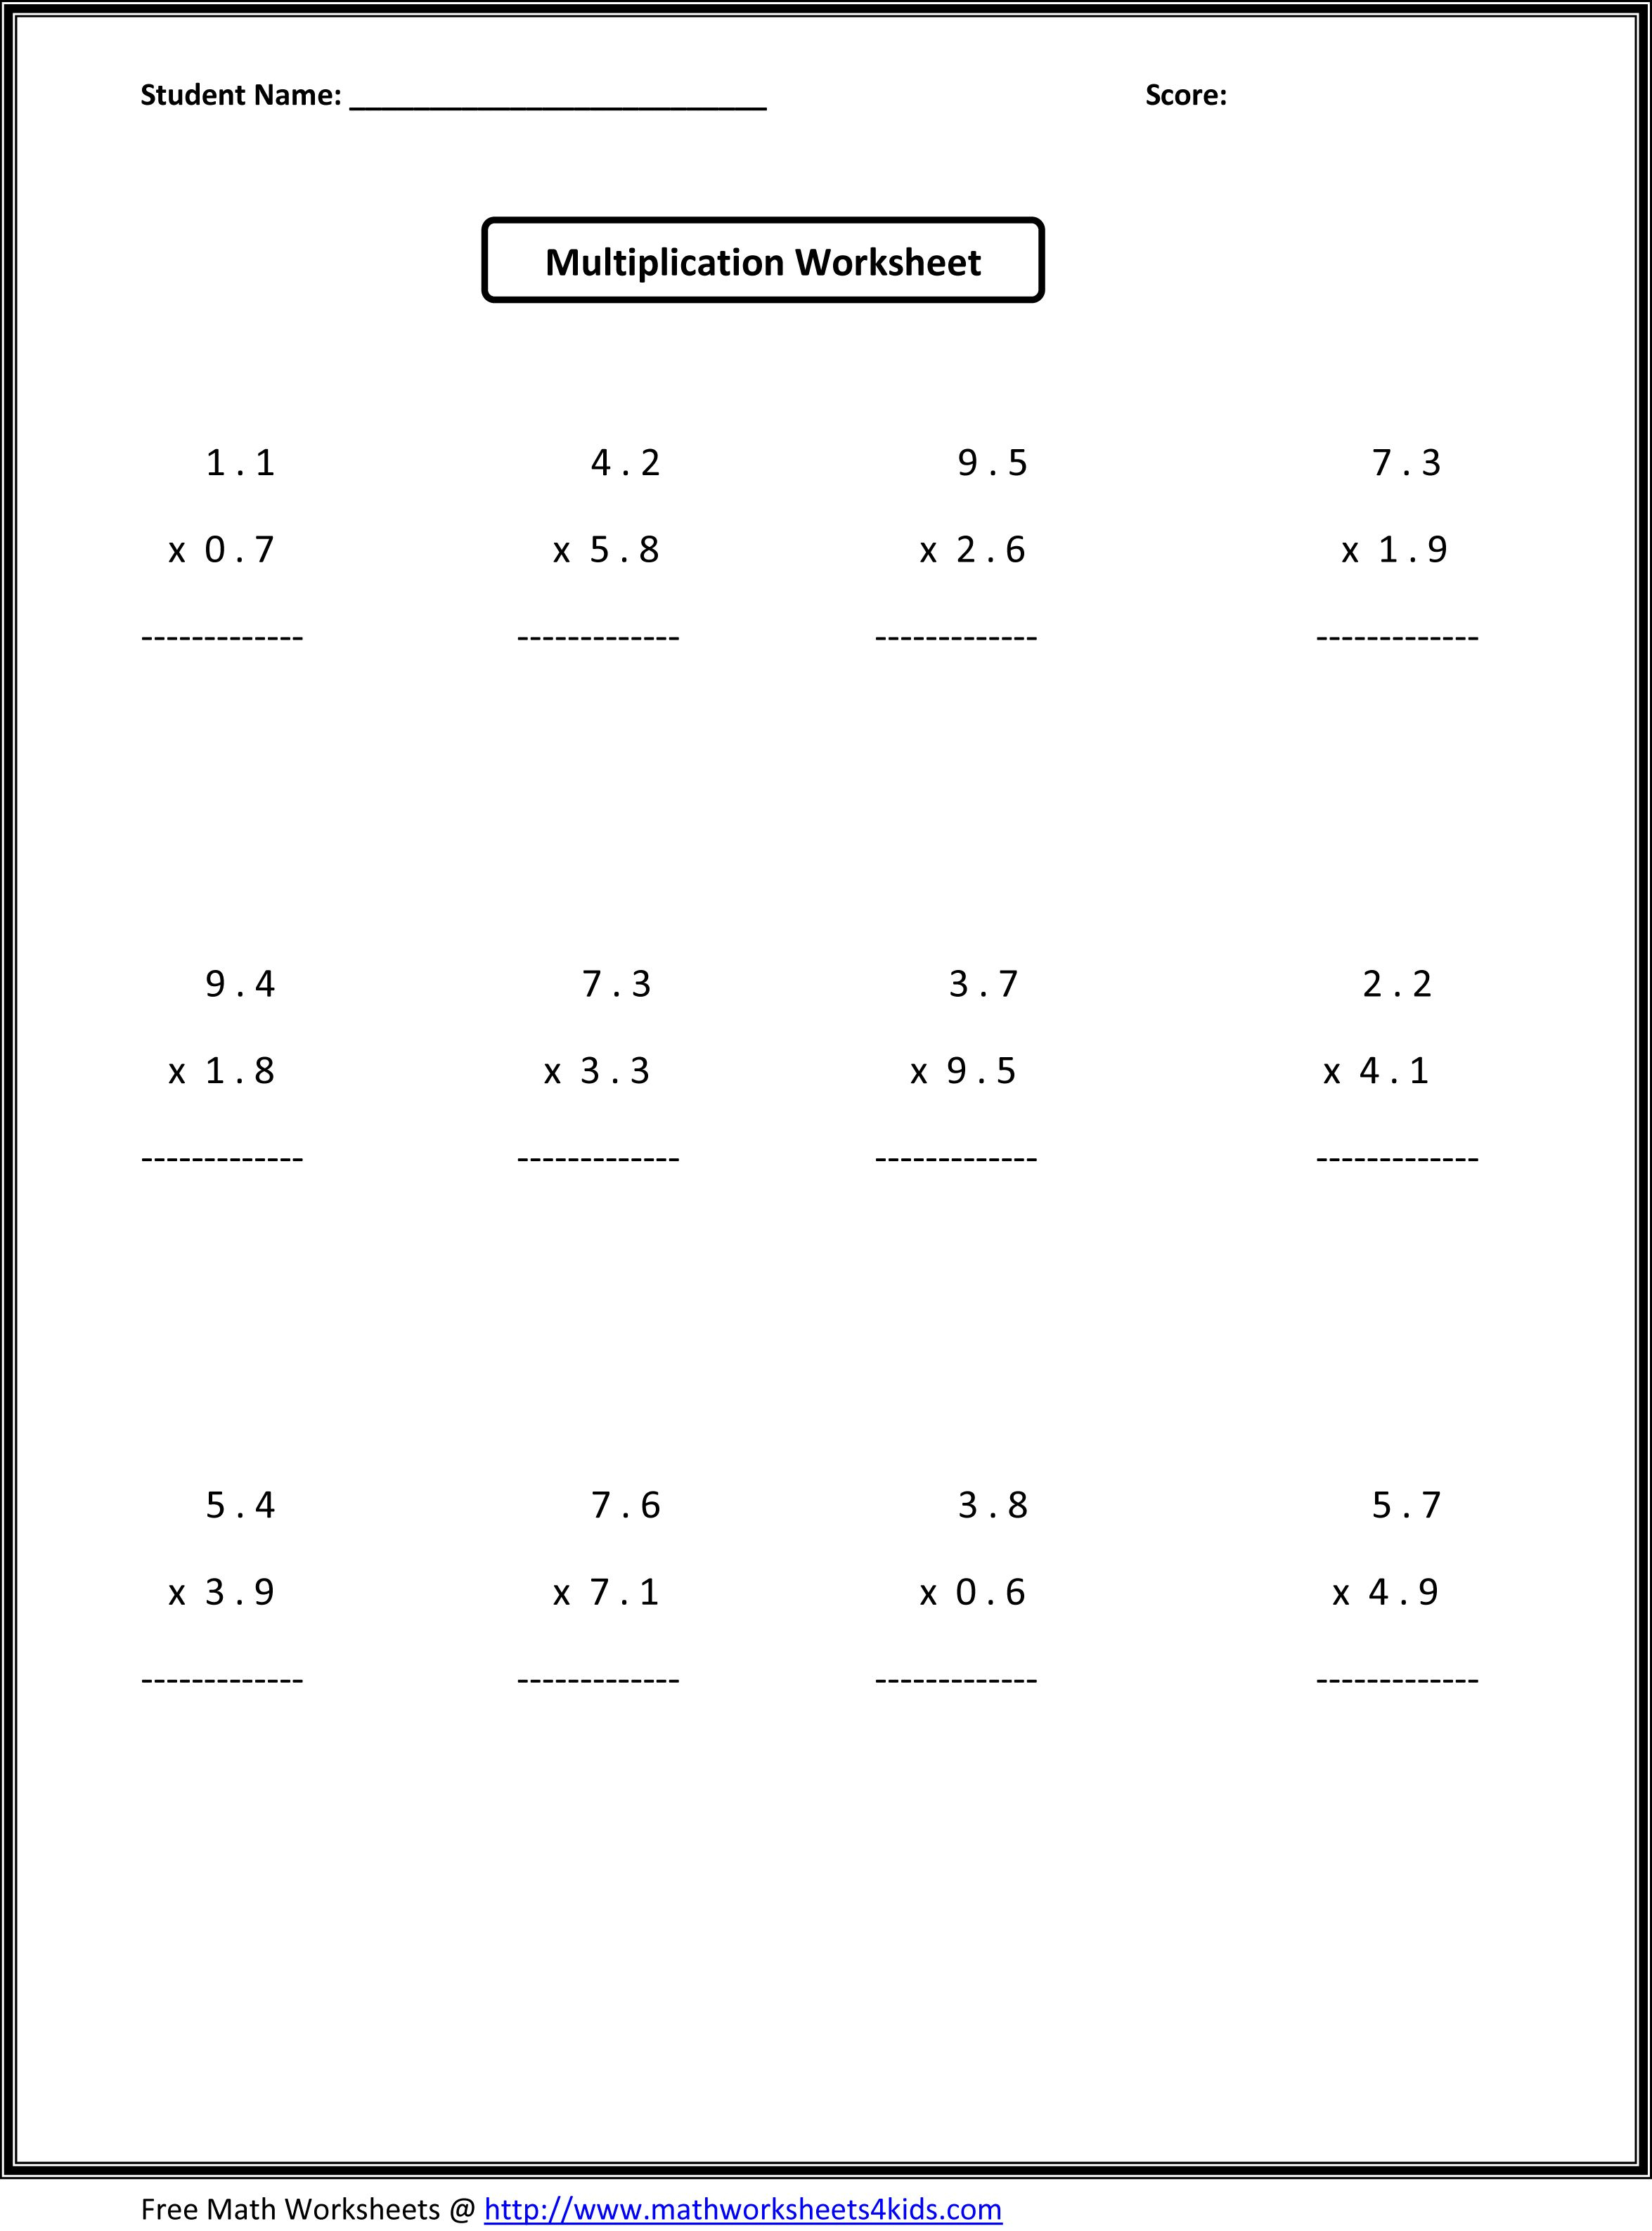 Multiplication Worksheets 7th Grade Printable